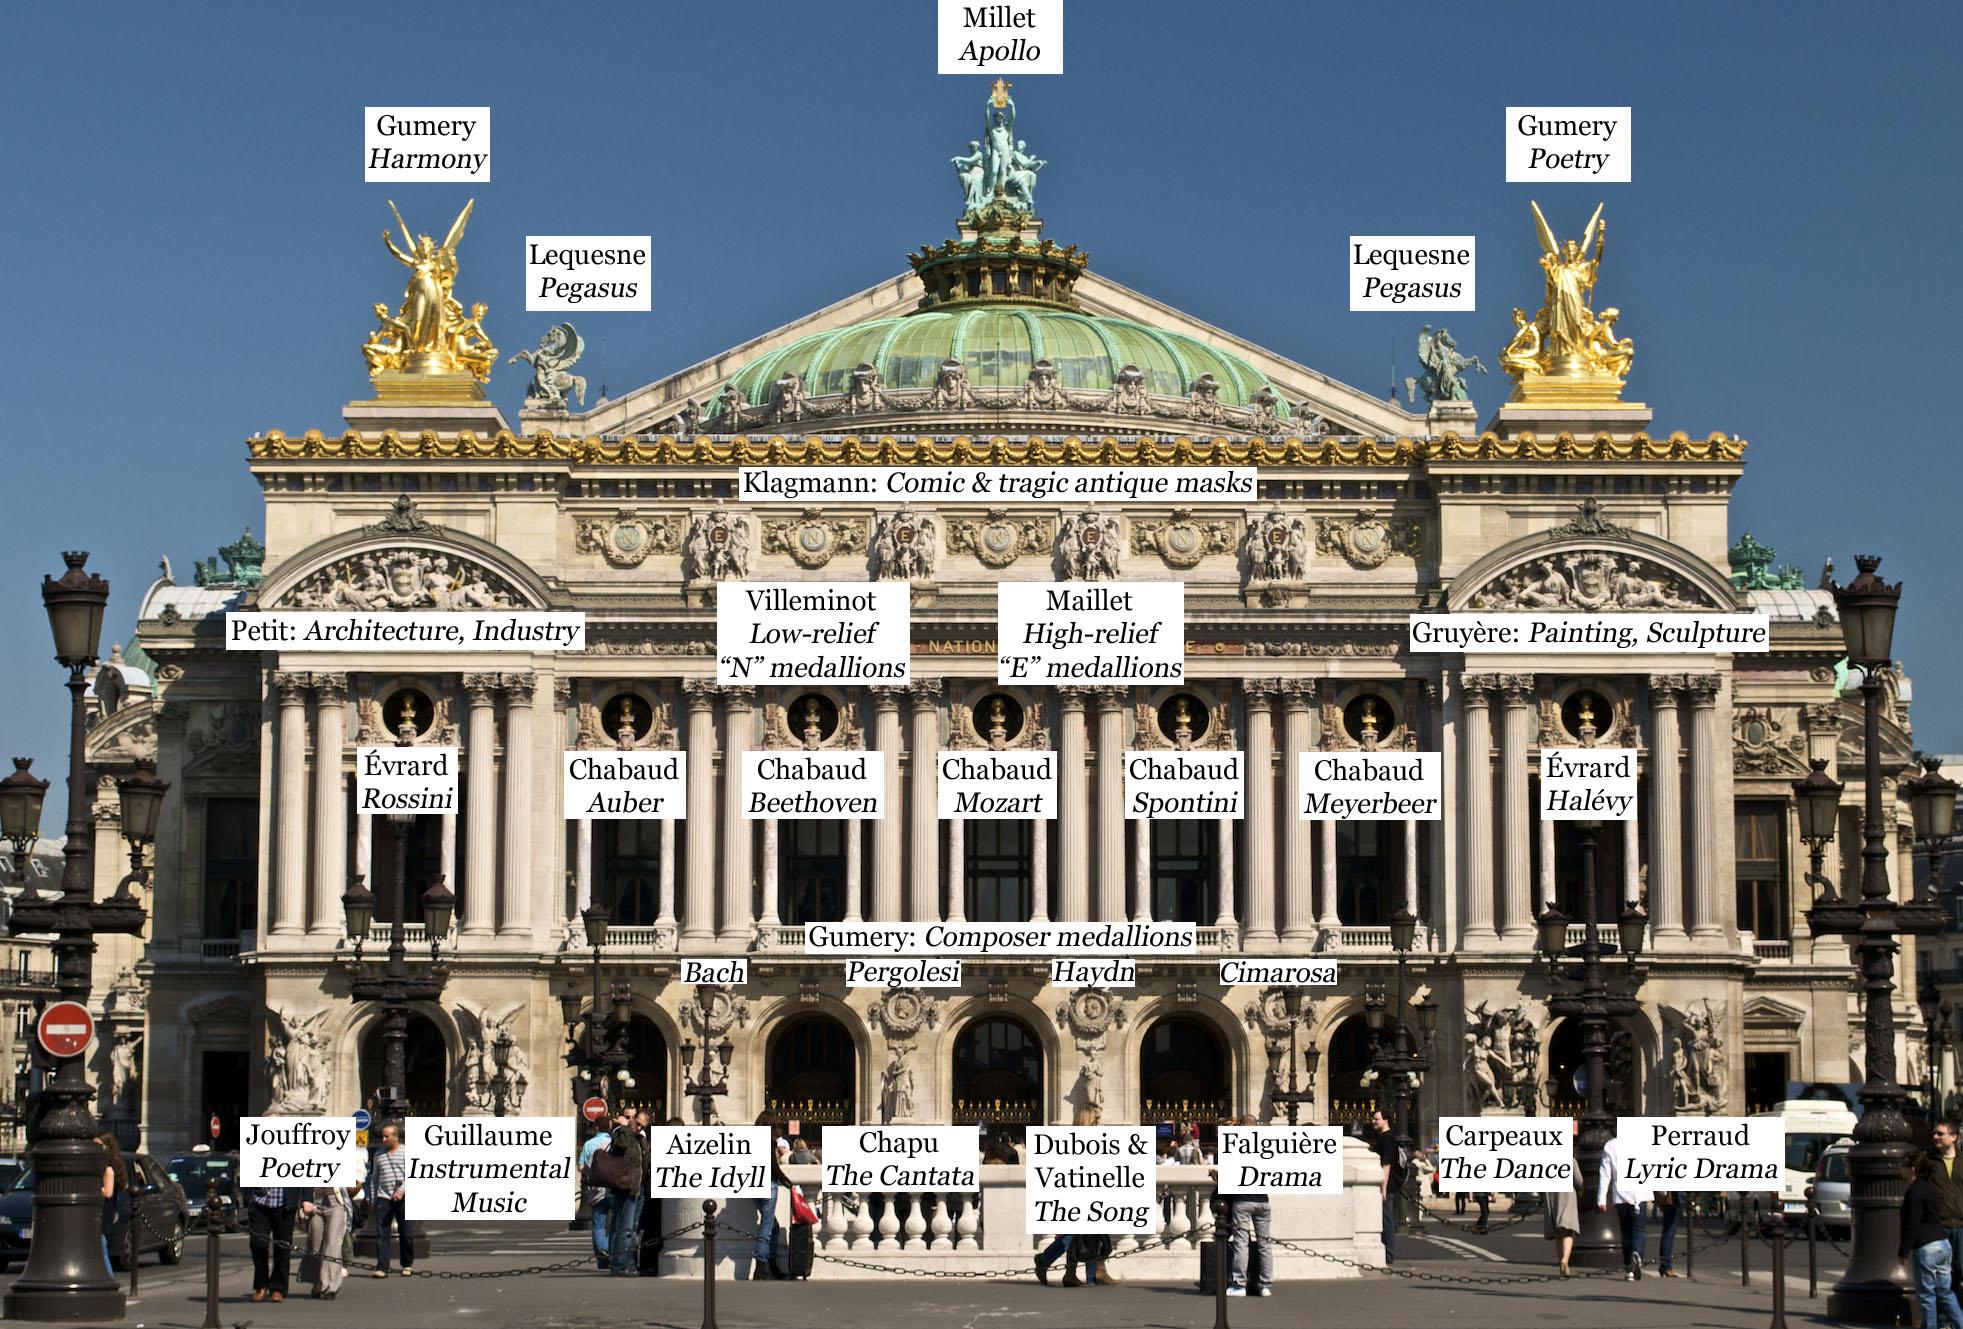 Casino Floor Plans File Op 233 Ra Garnier Facade With Sculpture Labels Jpg